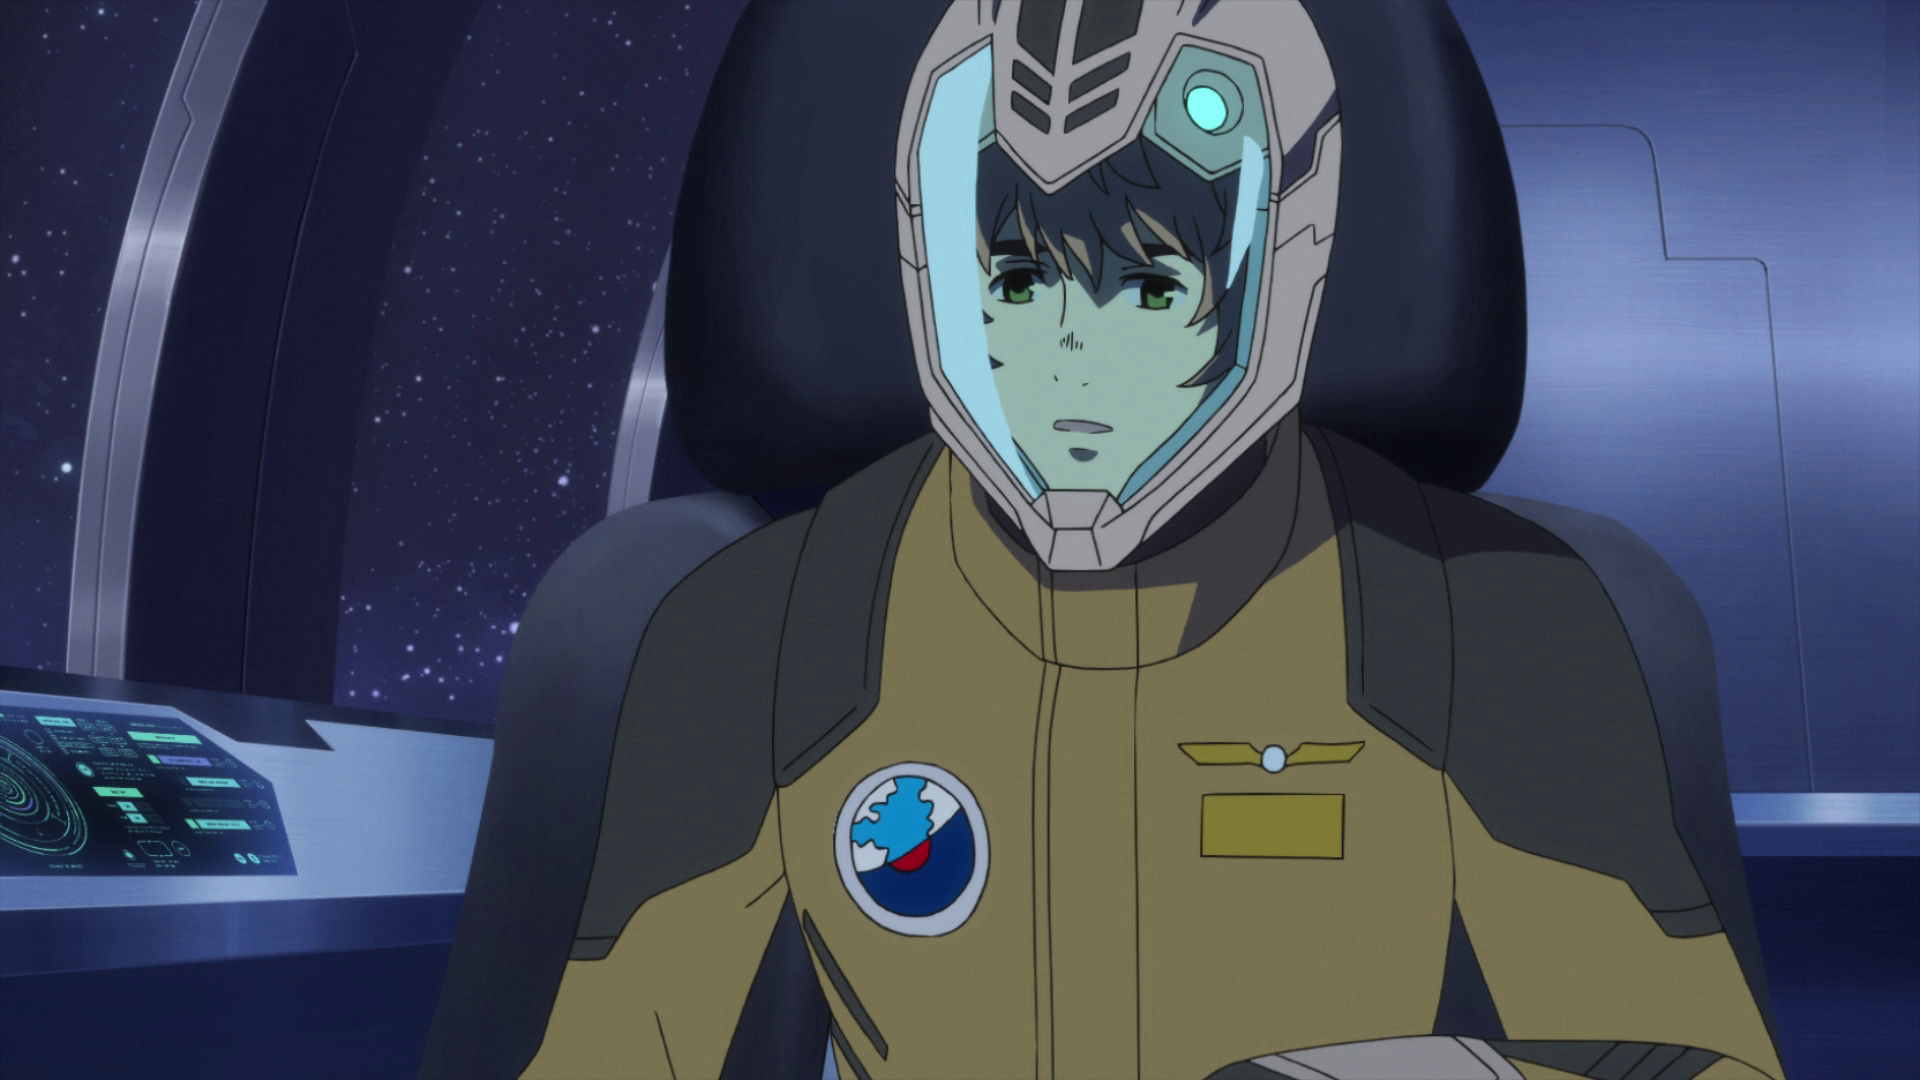 [Golumpa] Space Battleship Tiramisu S2 - 03 (Uchuu Senkan